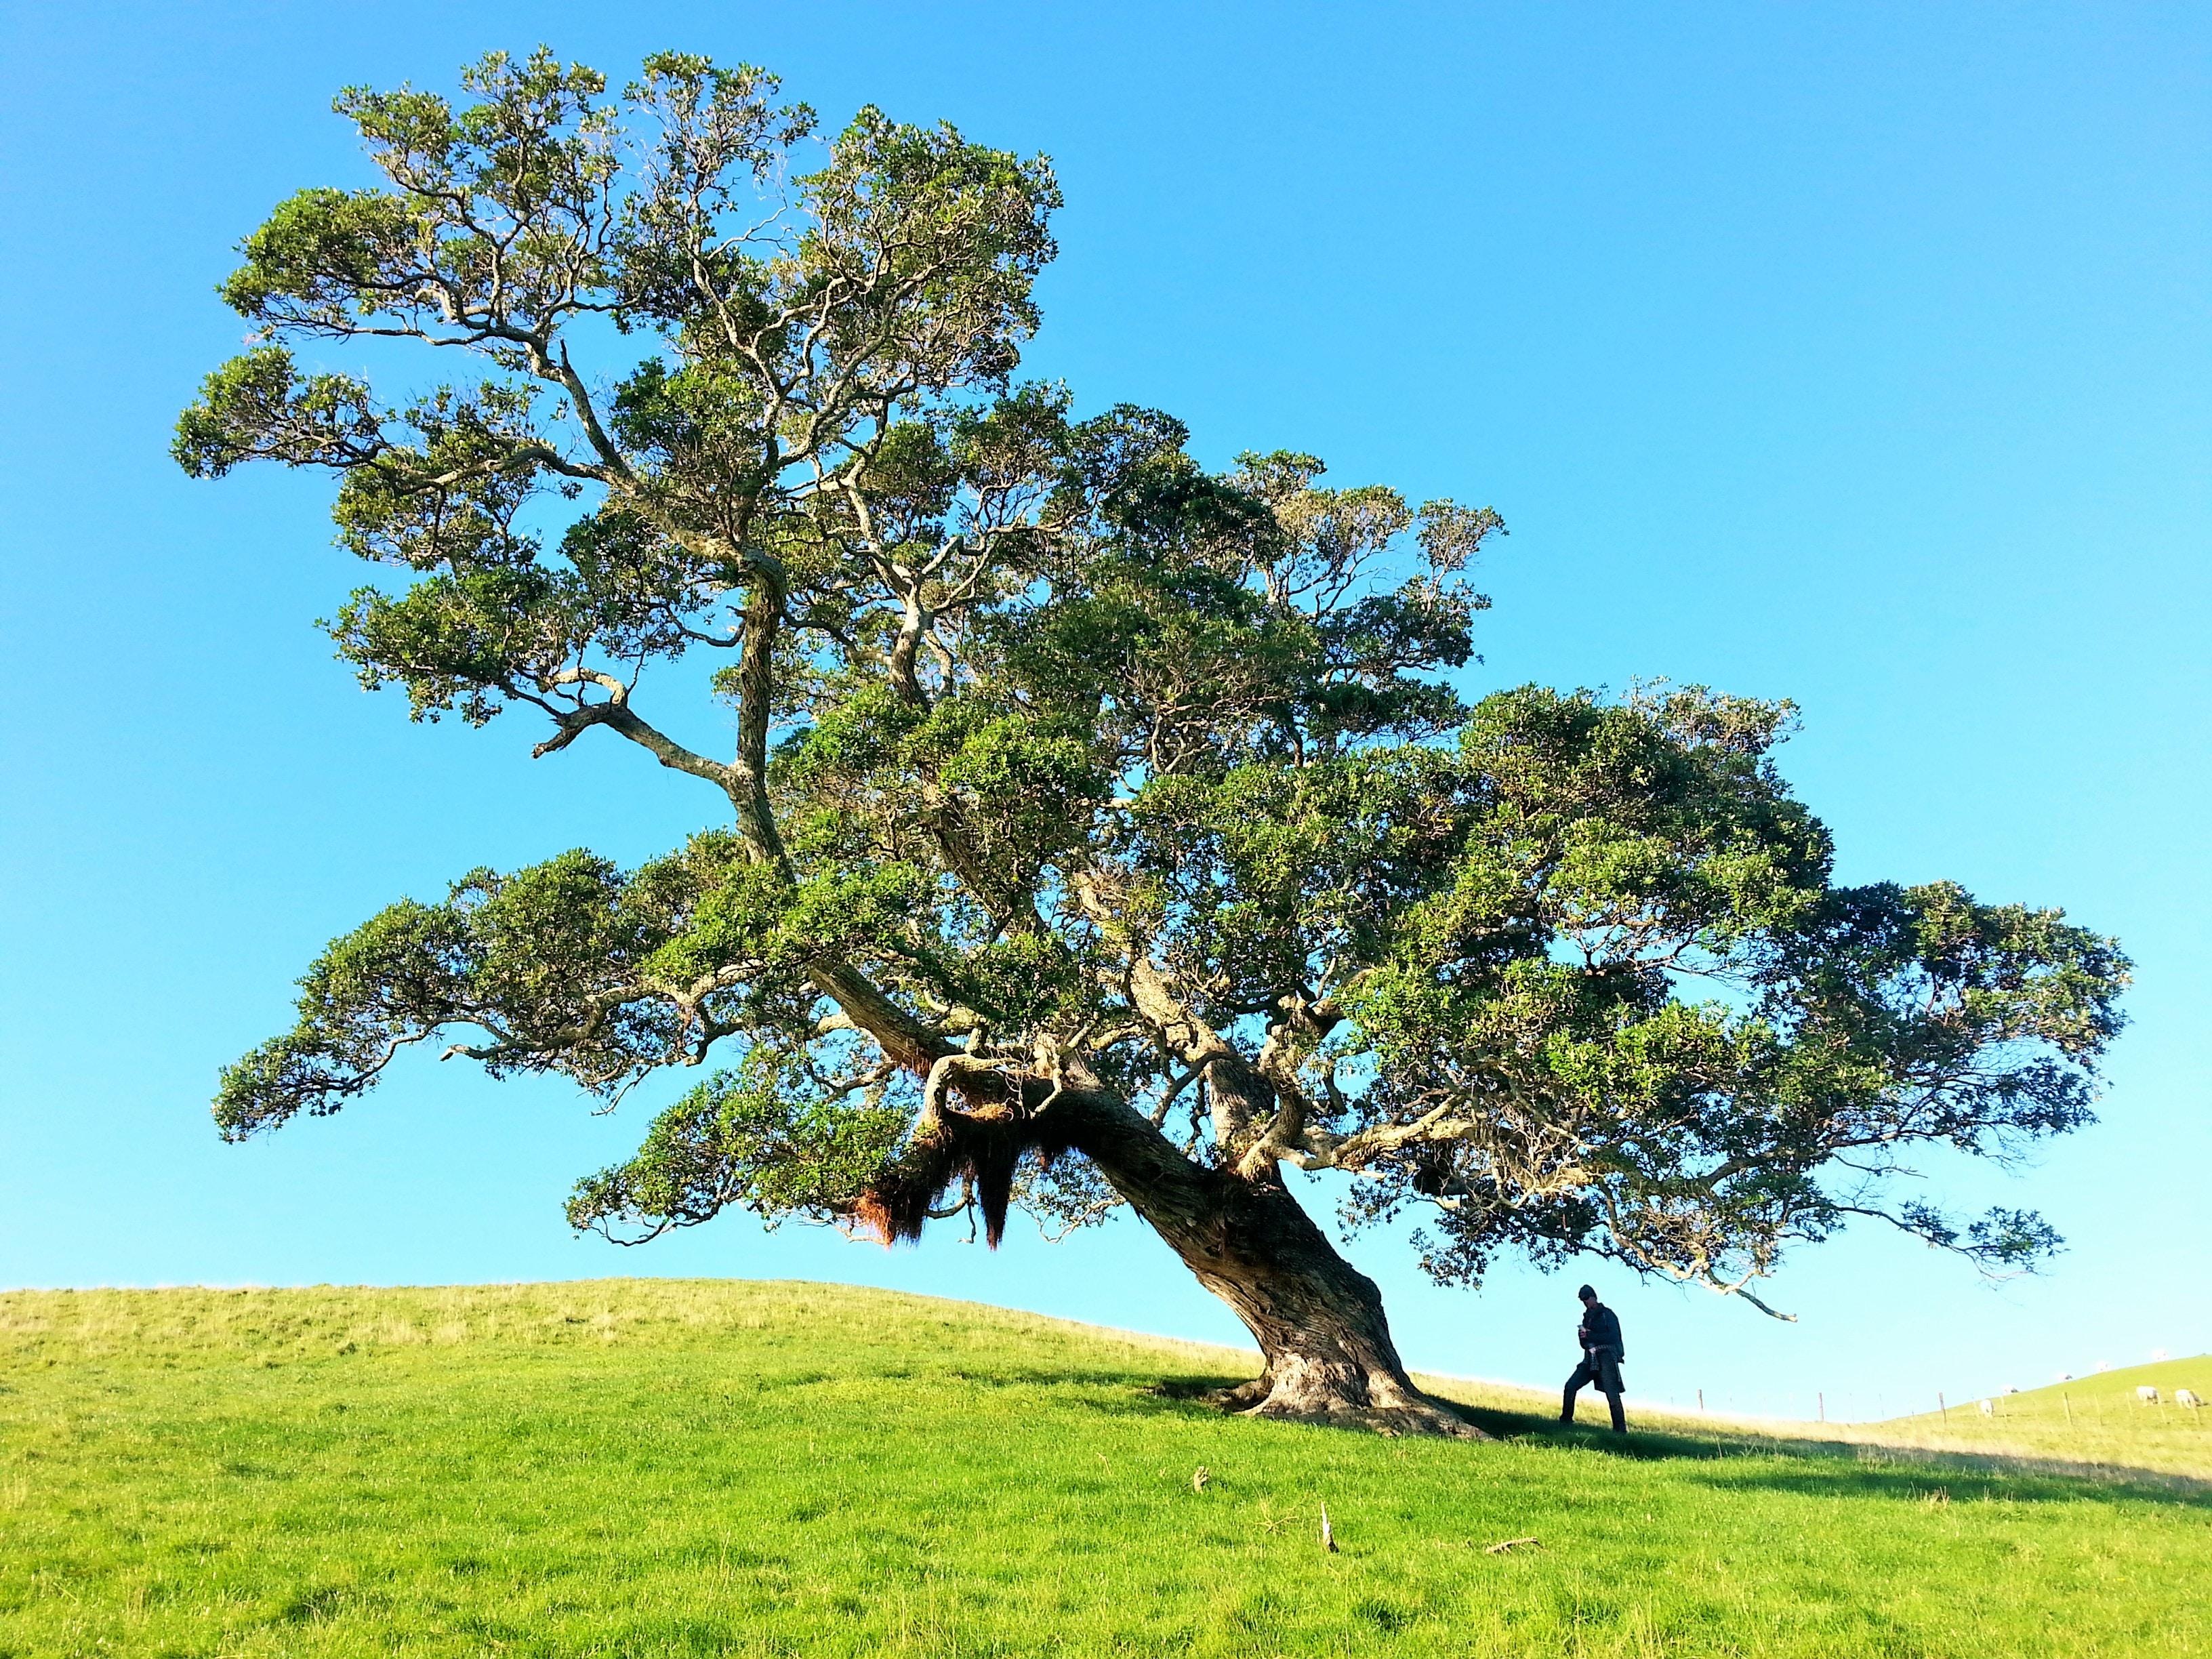 man under tree during daytime